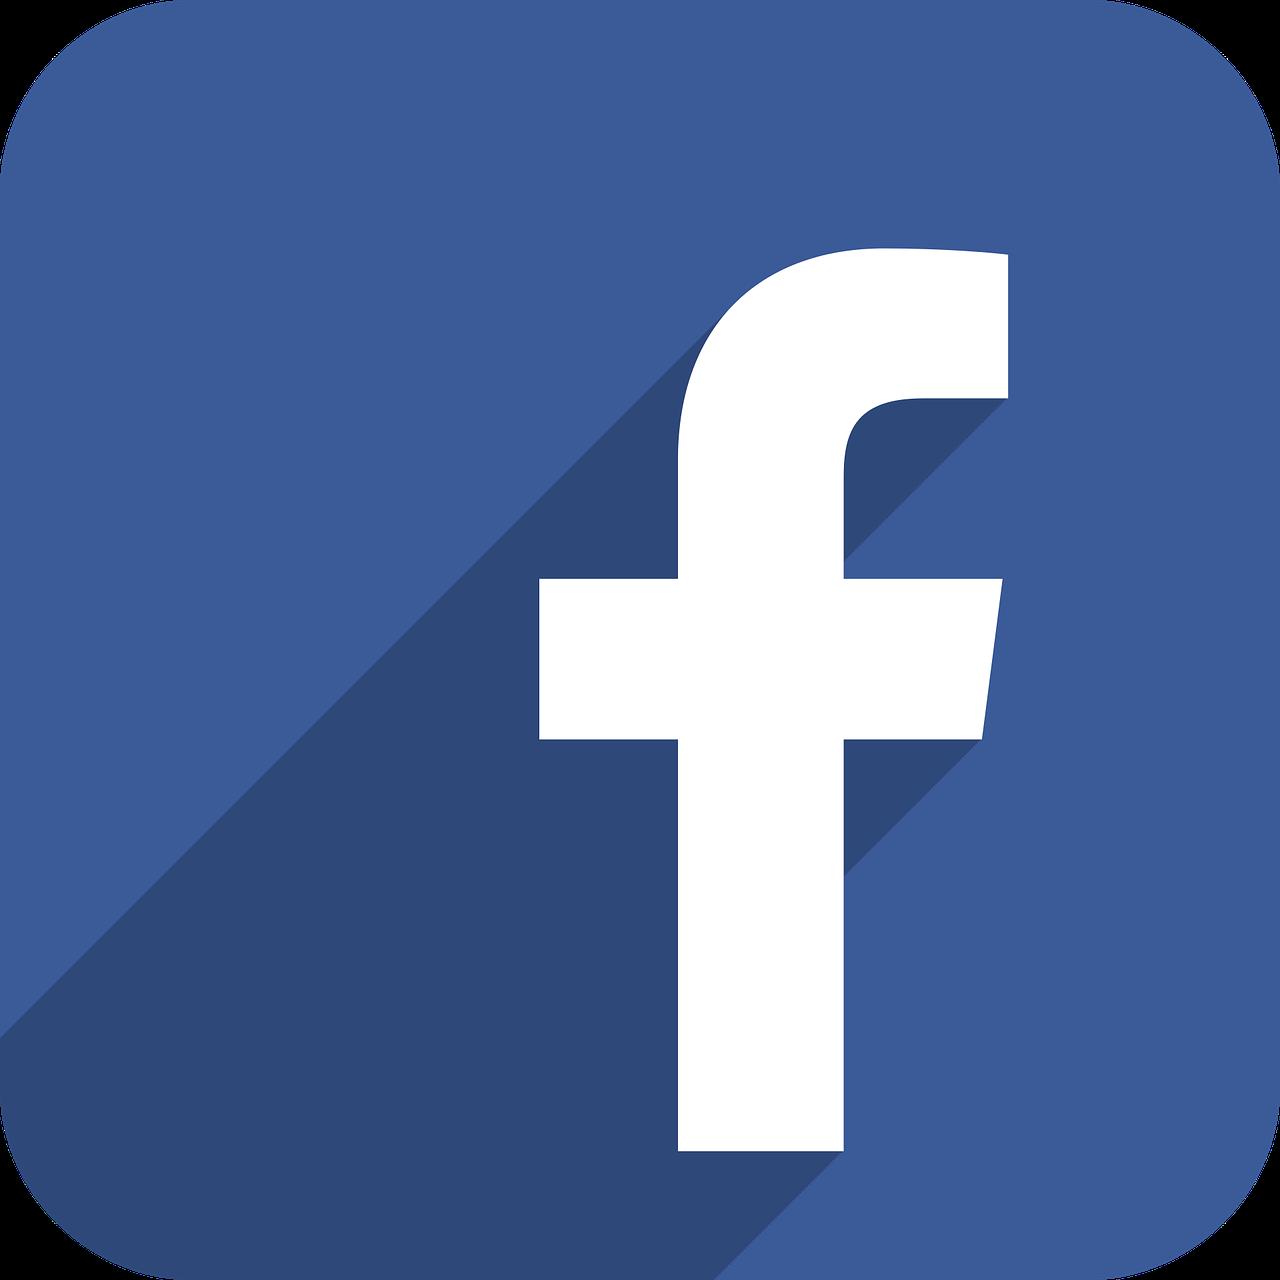 Facebook Icona Simbolo - Grafica vettoriale gratuita su Pixabay